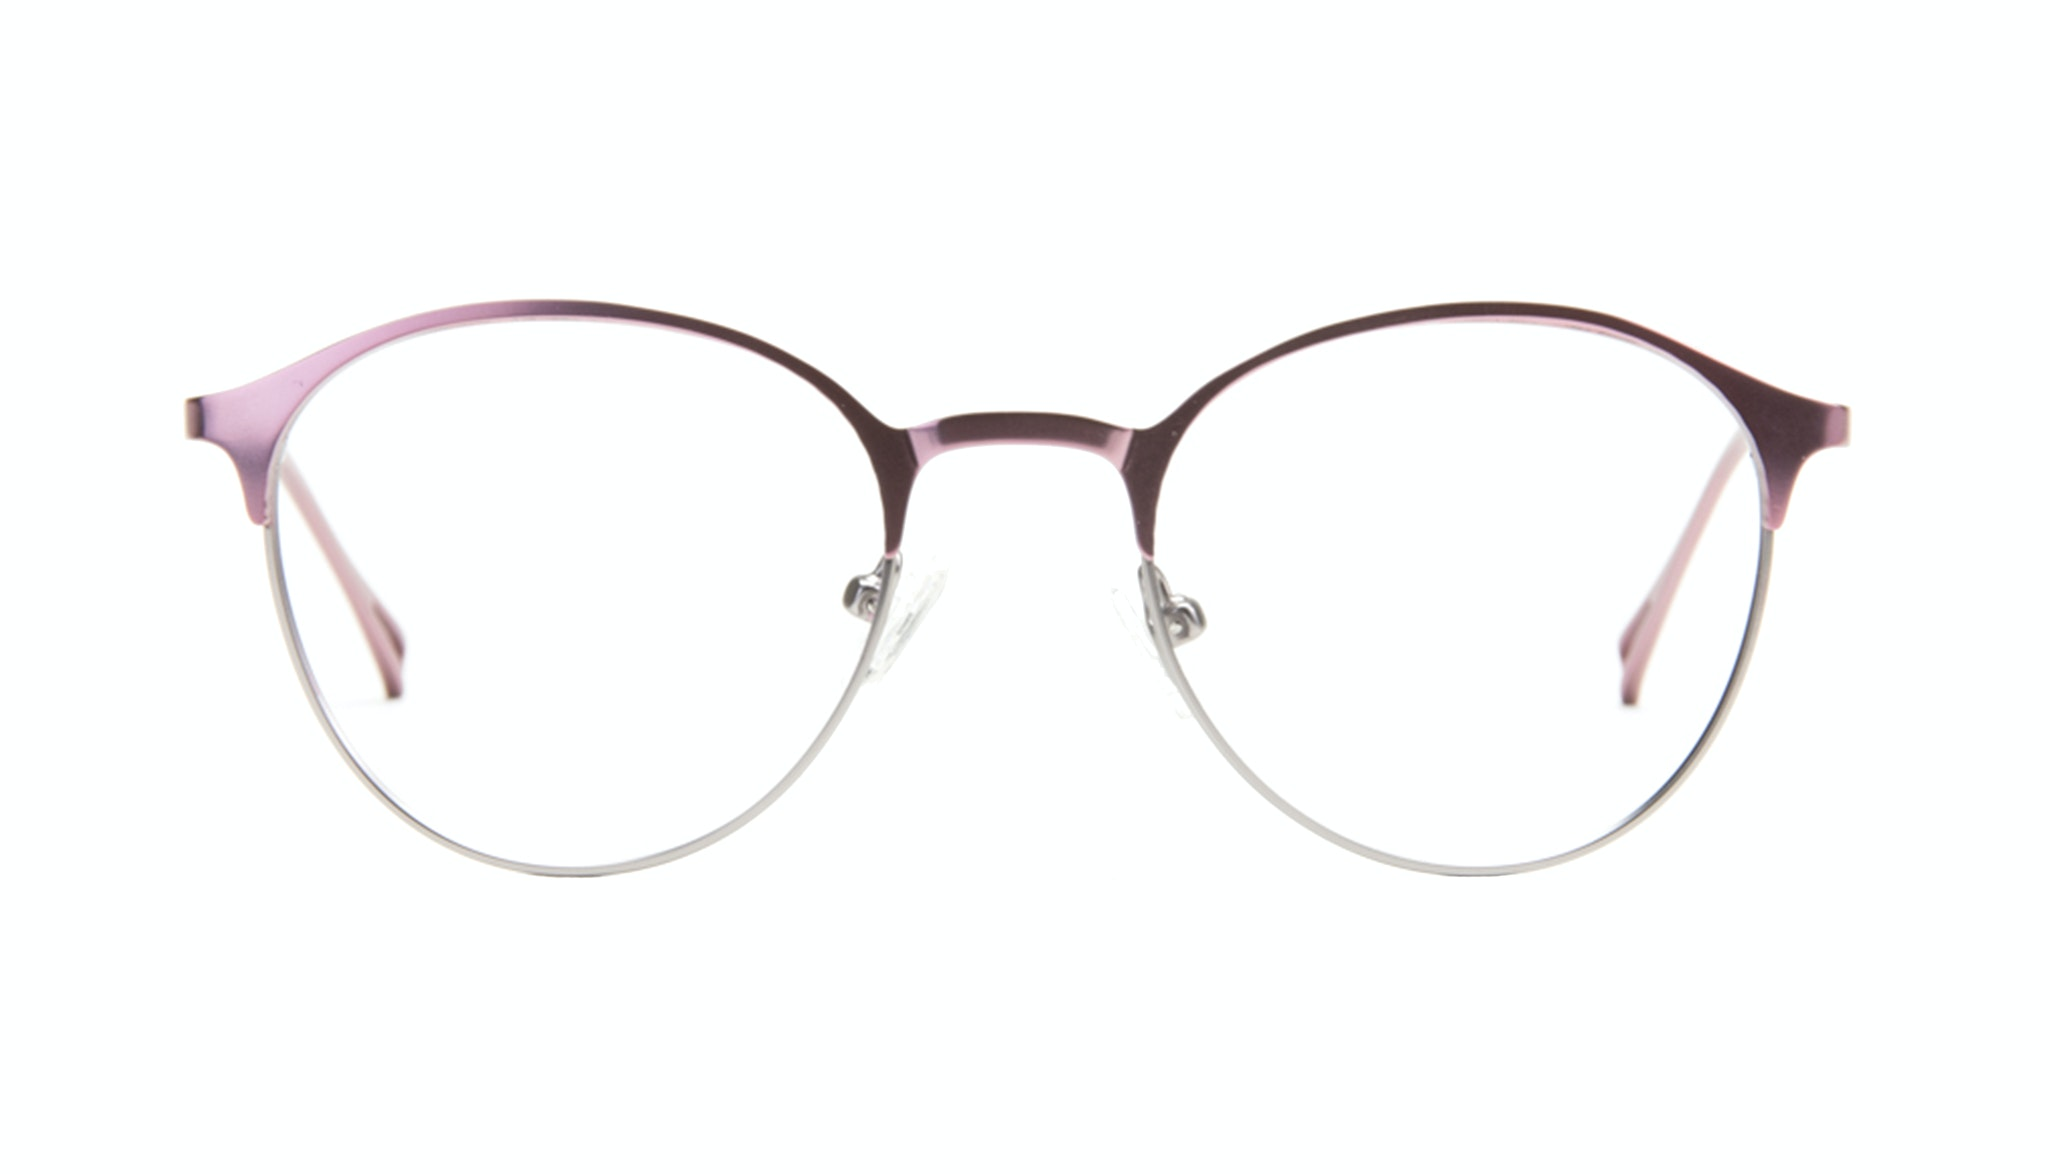 Affordable Fashion Glasses Round Eyeglasses Women Bay Shell Front